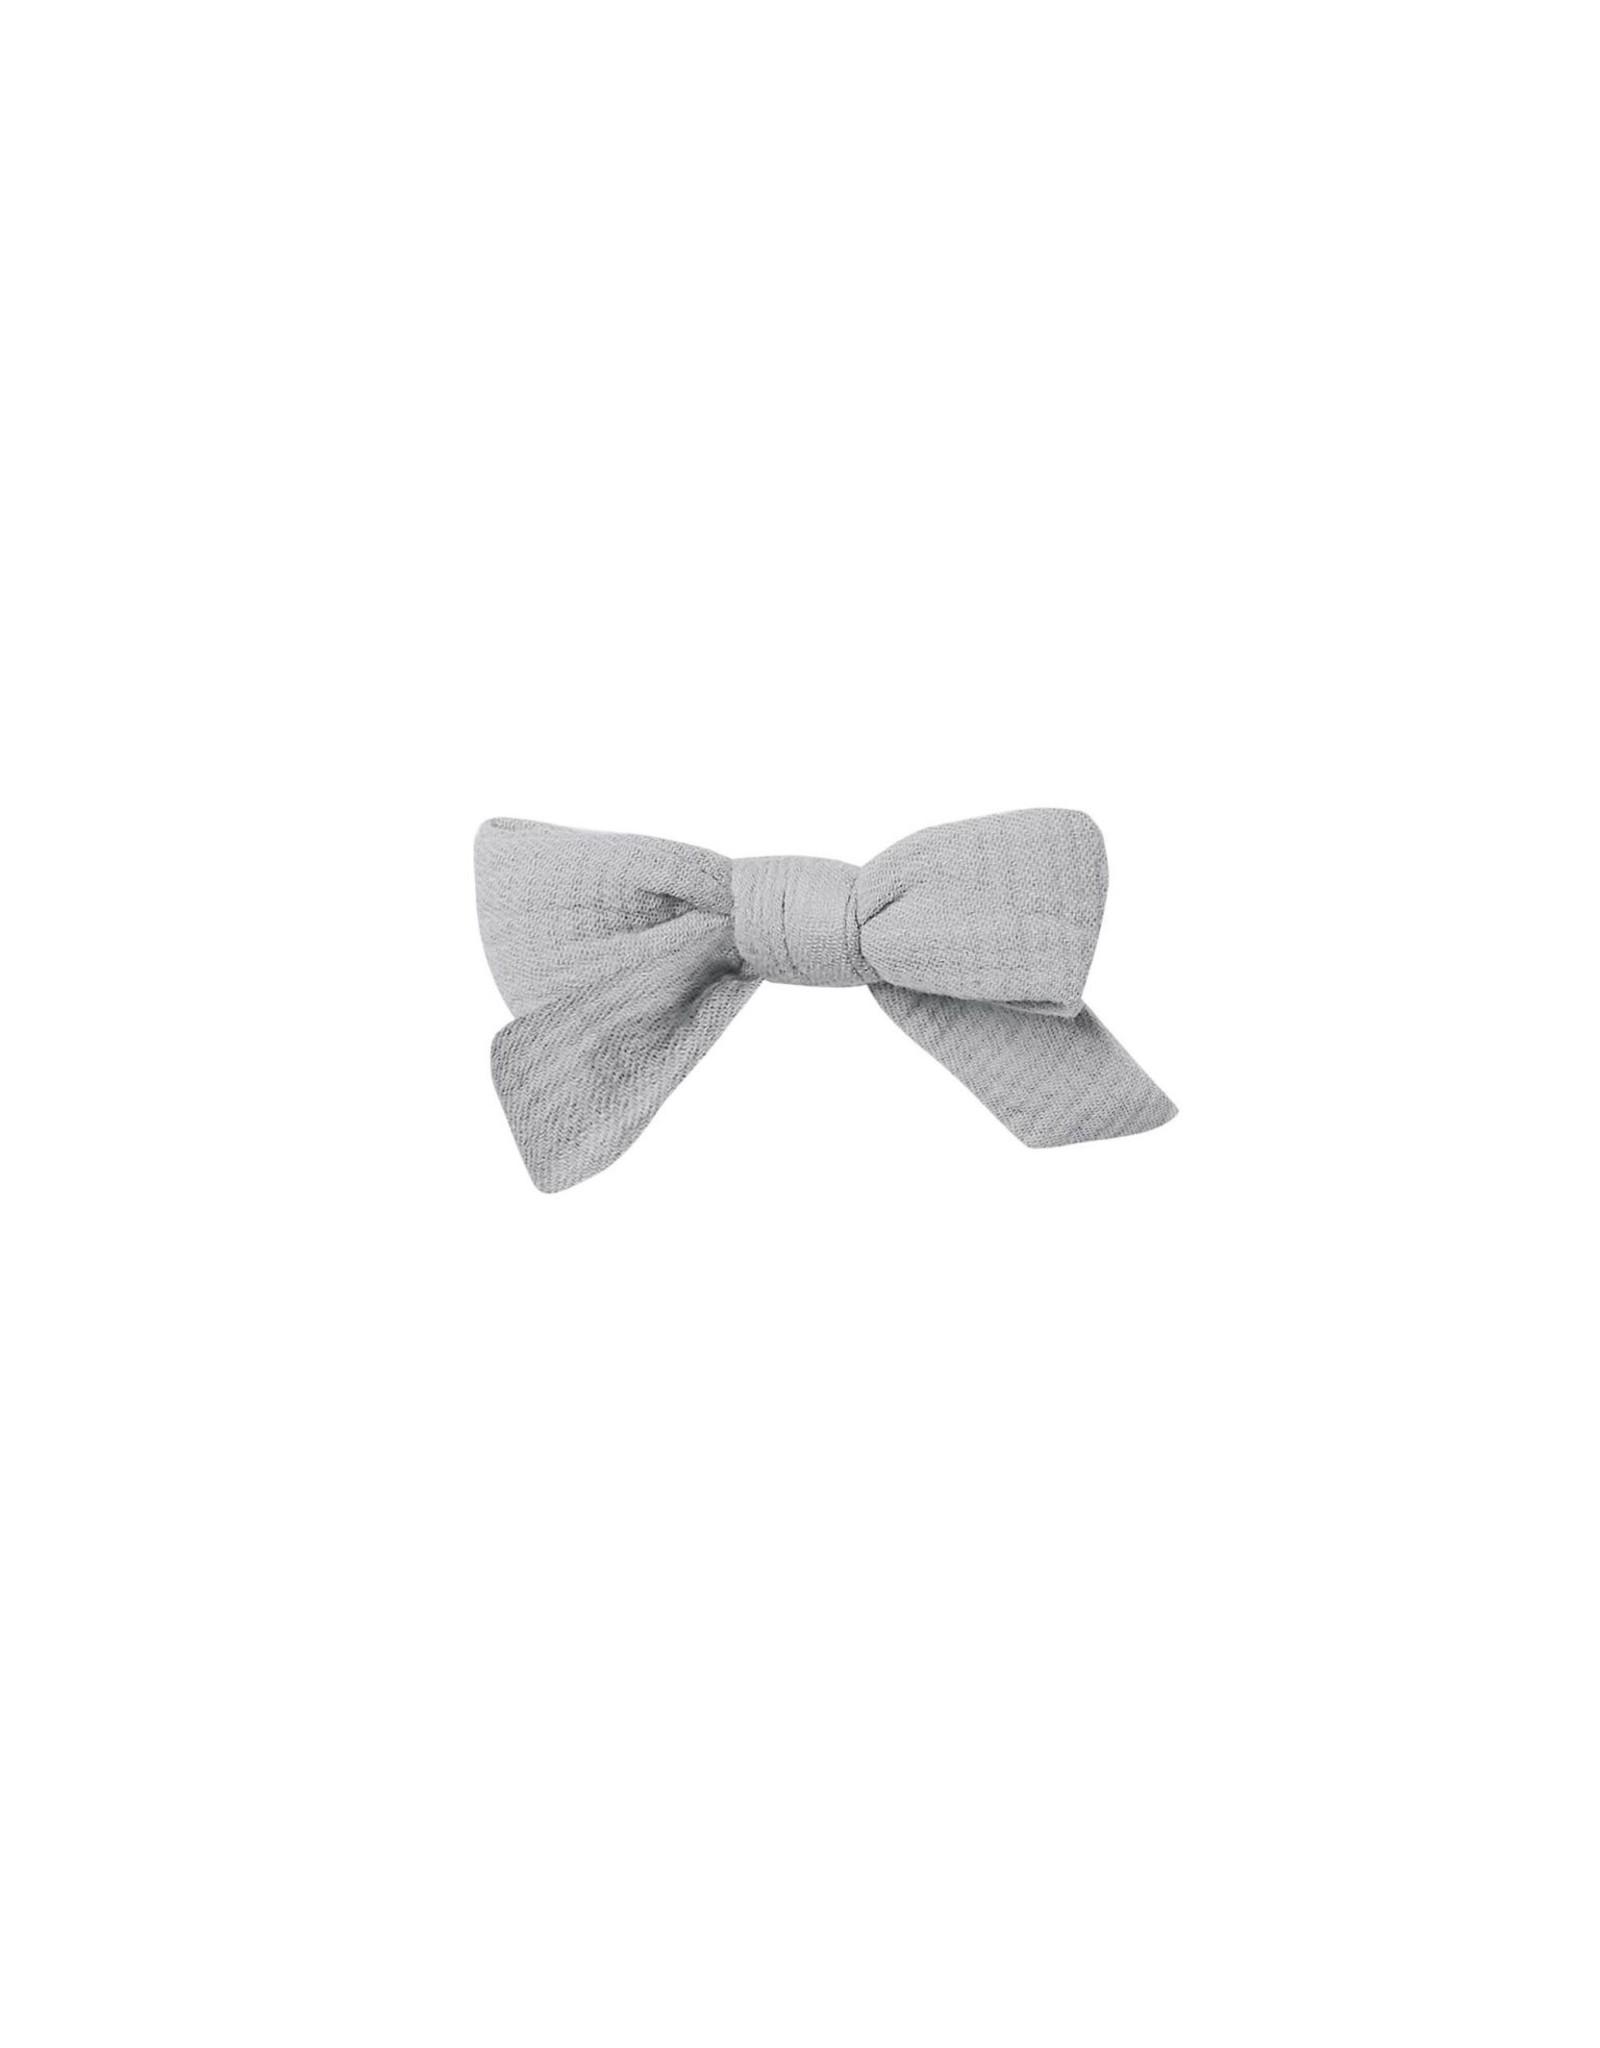 Quincy Mae schoolgirl bow- periwinkle